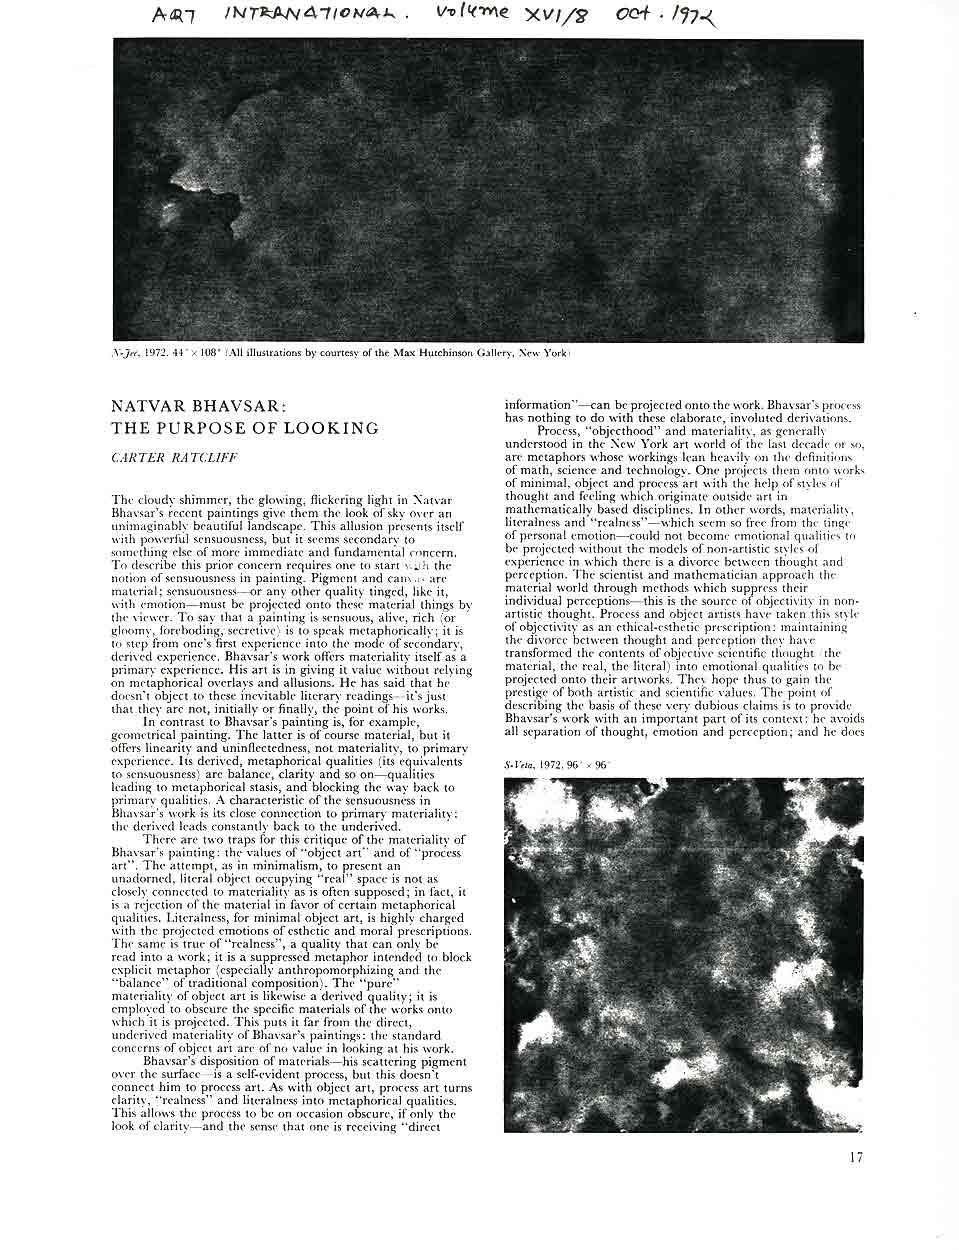 Natvar Bhavsar: The Purpose of Looking, article, pg 1